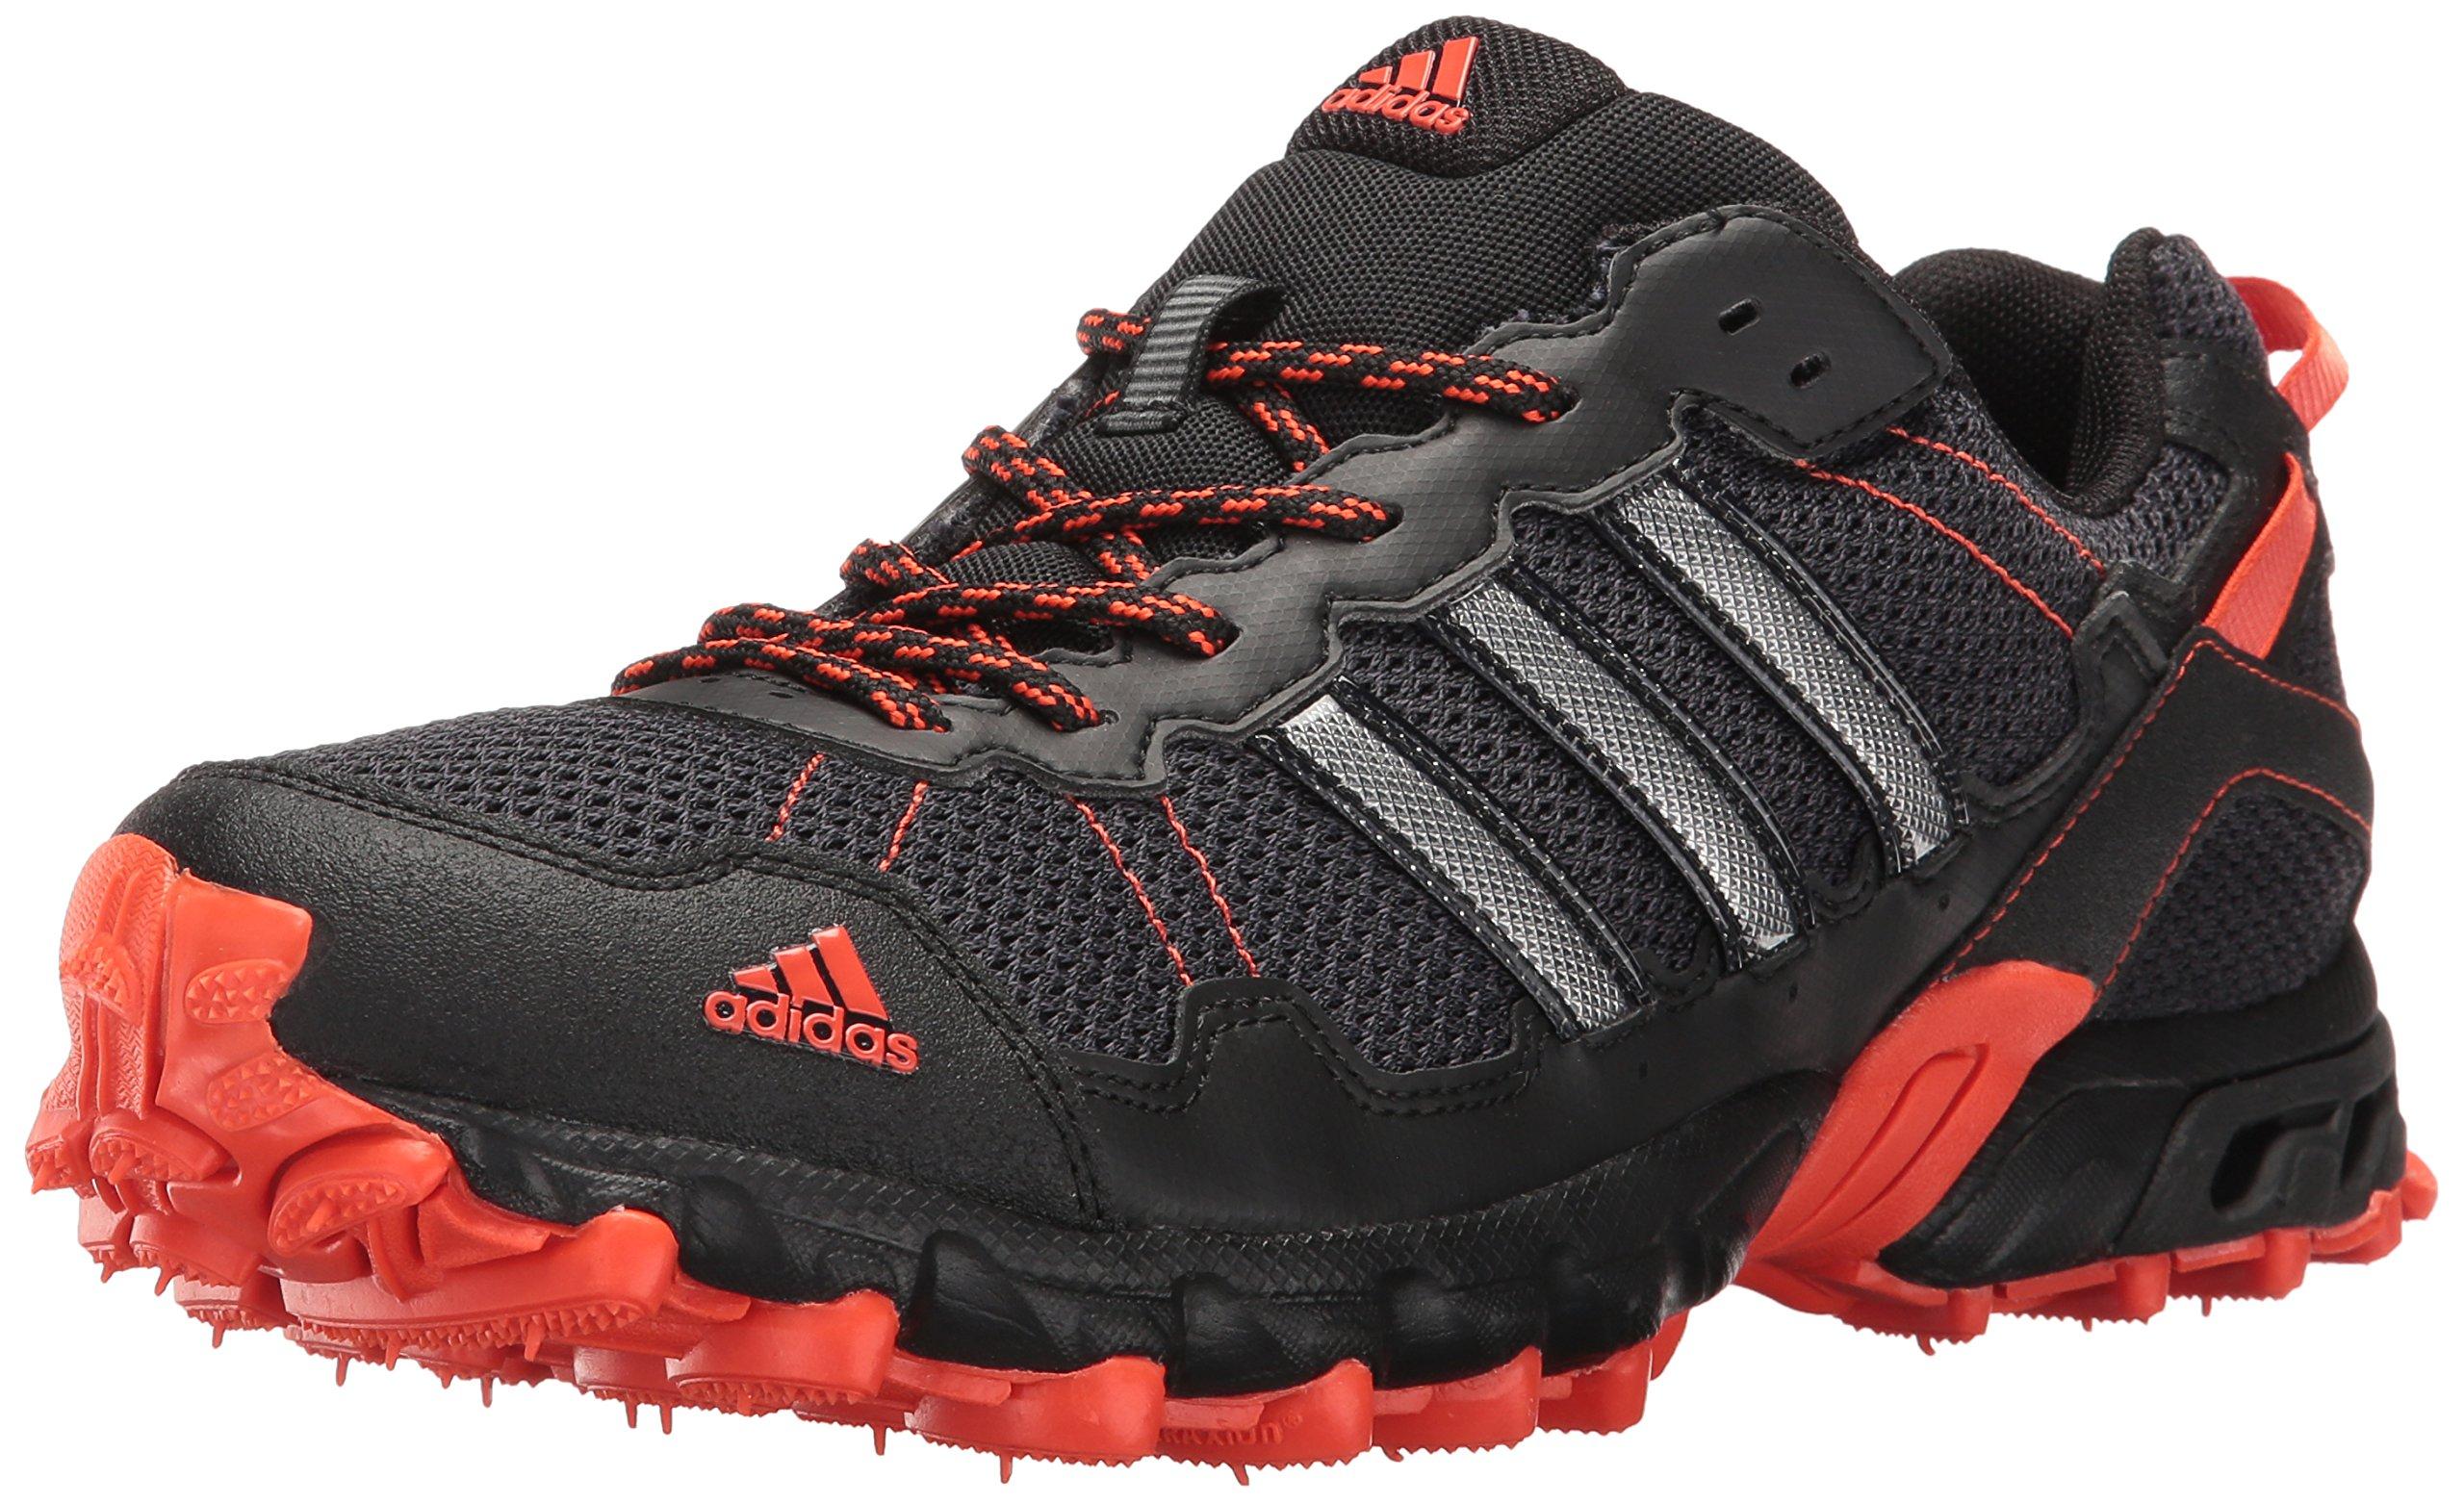 adidas Men's Rockadia Trail M Running Shoe, Black/Black/Energy, 11 M US by adidas